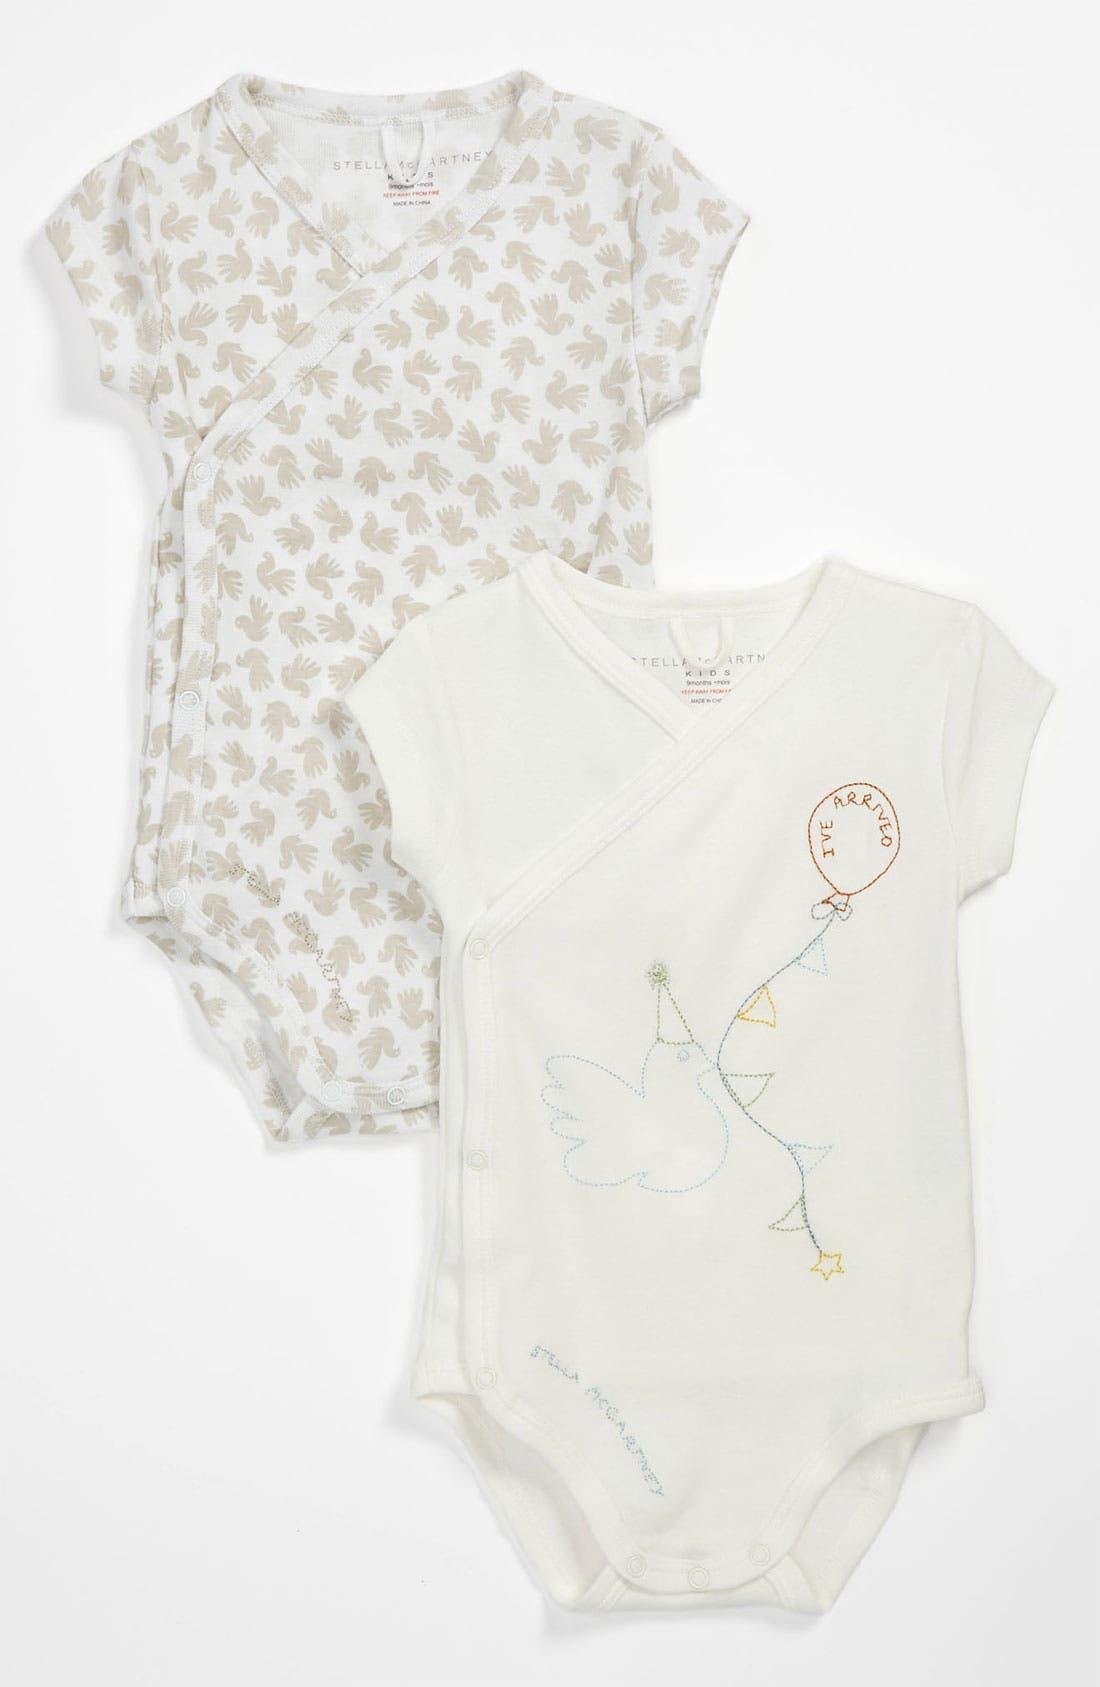 Alternate Image 1 Selected - Stella McCartney Kids 'Birdie Baby' Bodysuit Gift Set (Set of 2) (Baby)